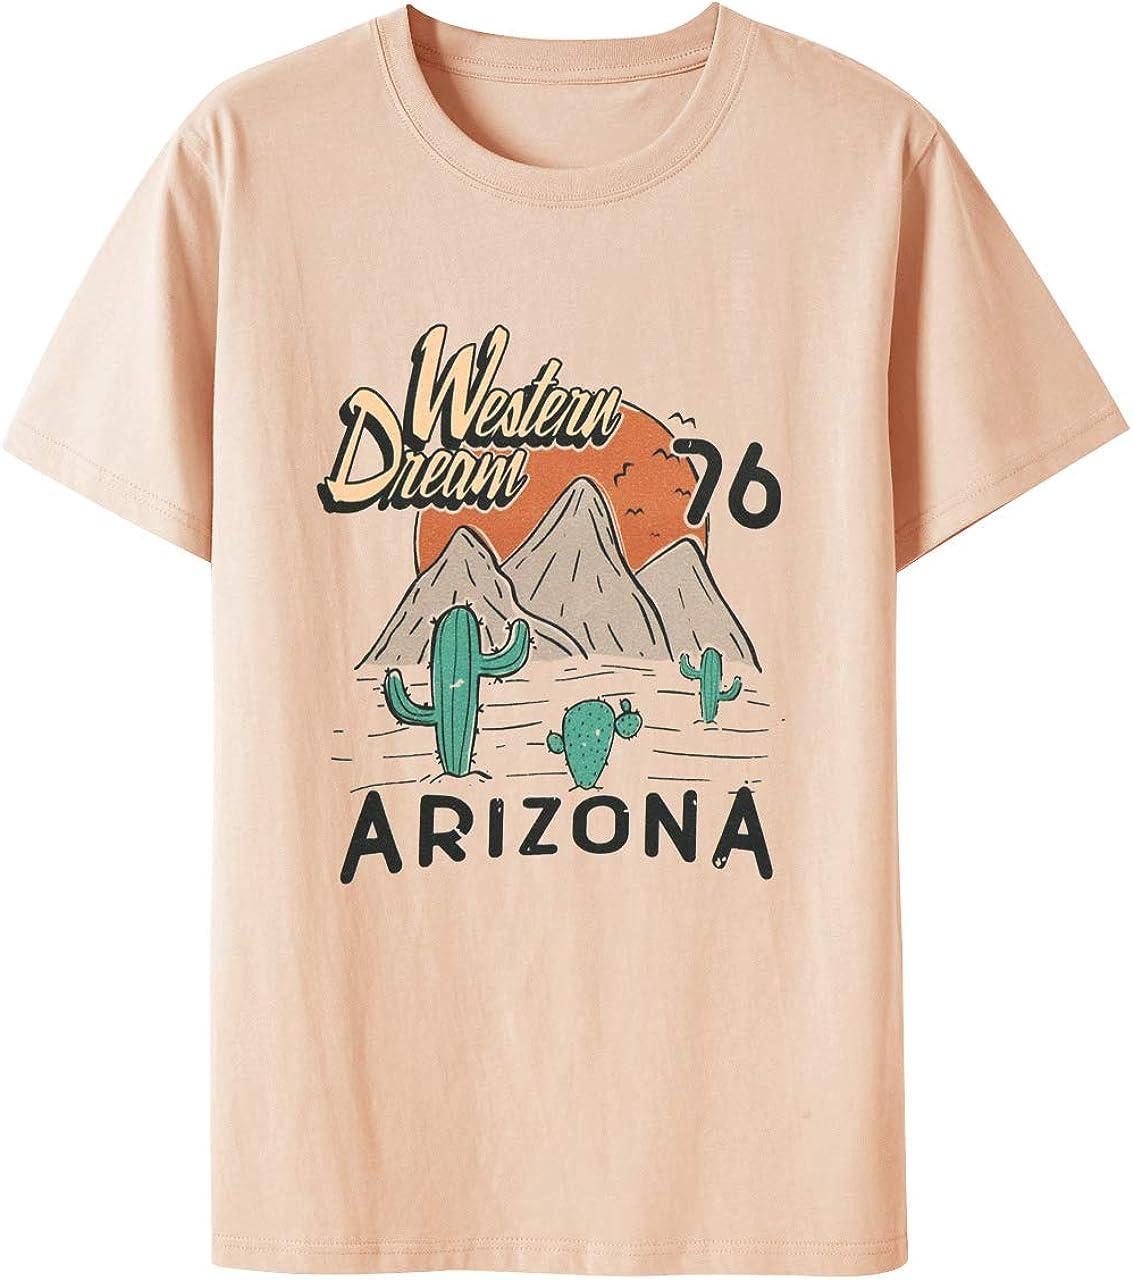 Desert Cactus Tee Women Western Sunset Graphic Shirt Rock Music Short Sleeve Top